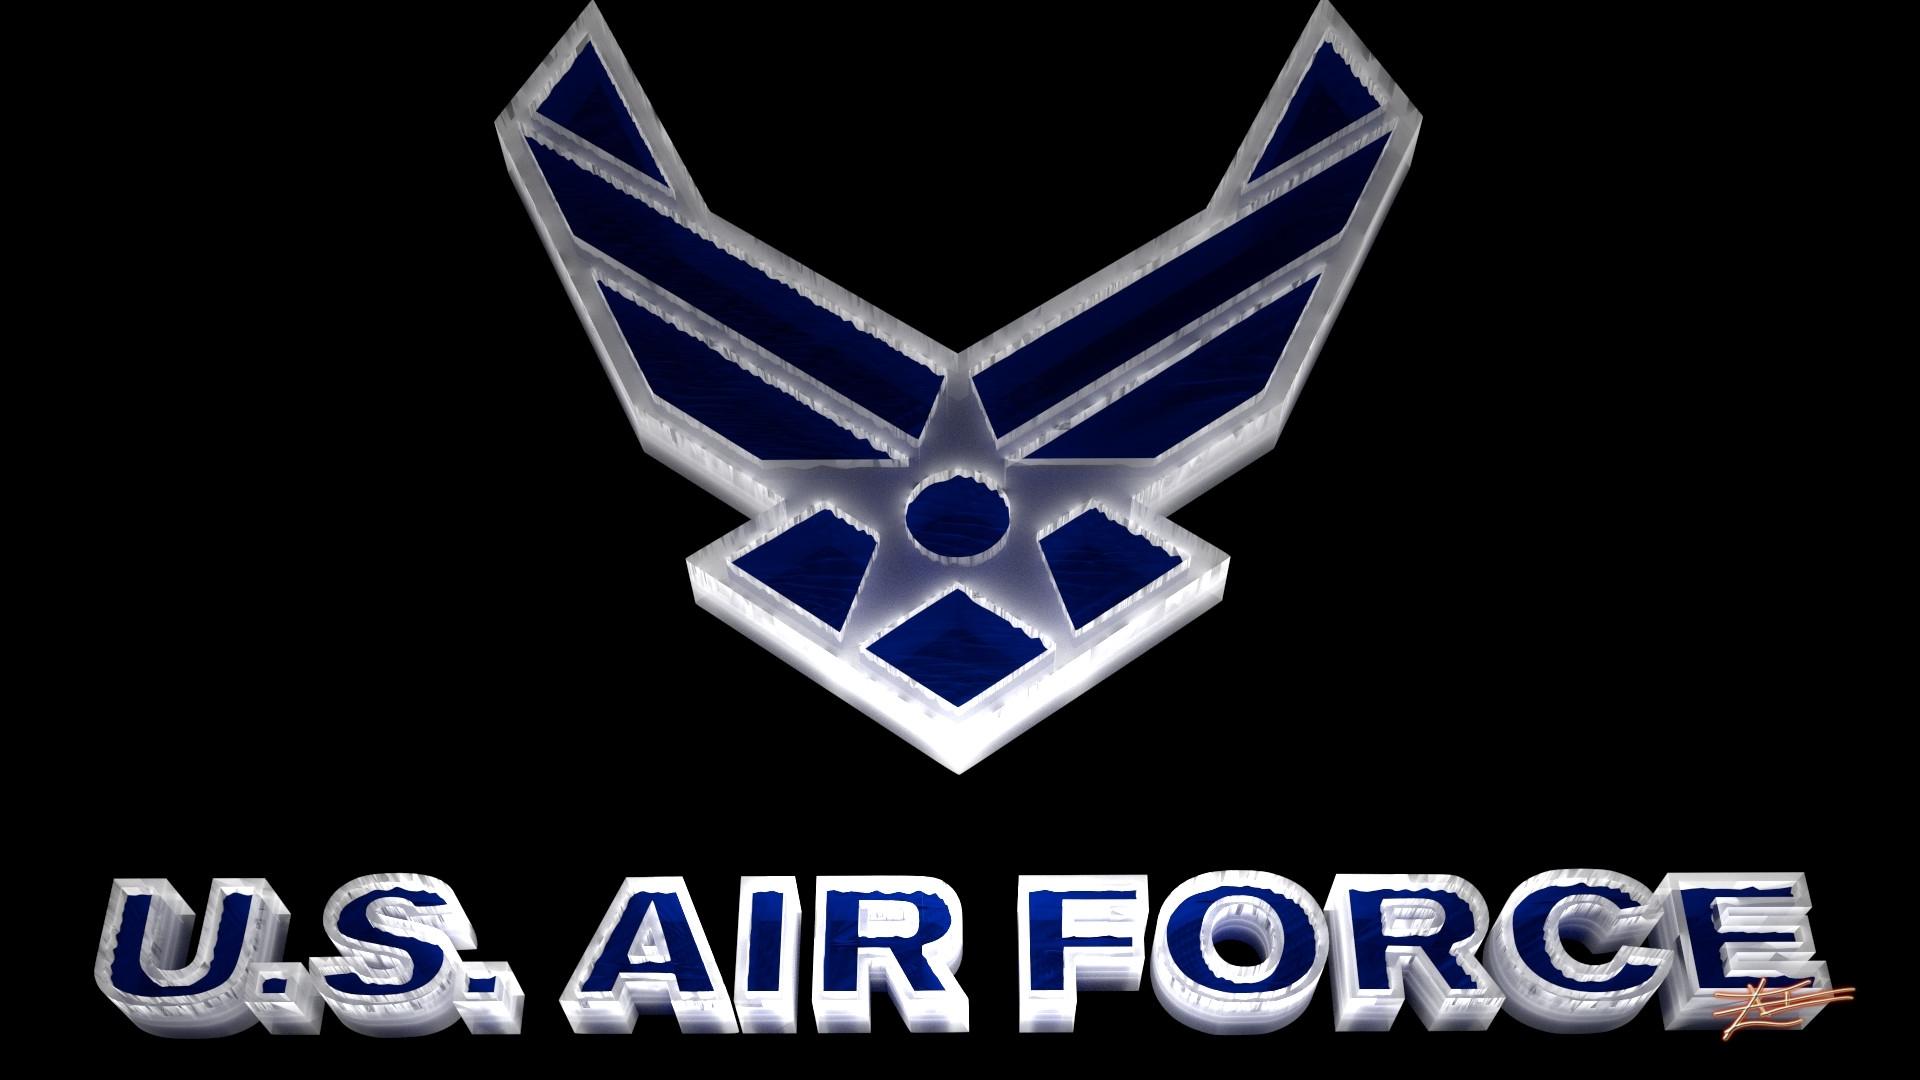 air force logo wallpaper ·①